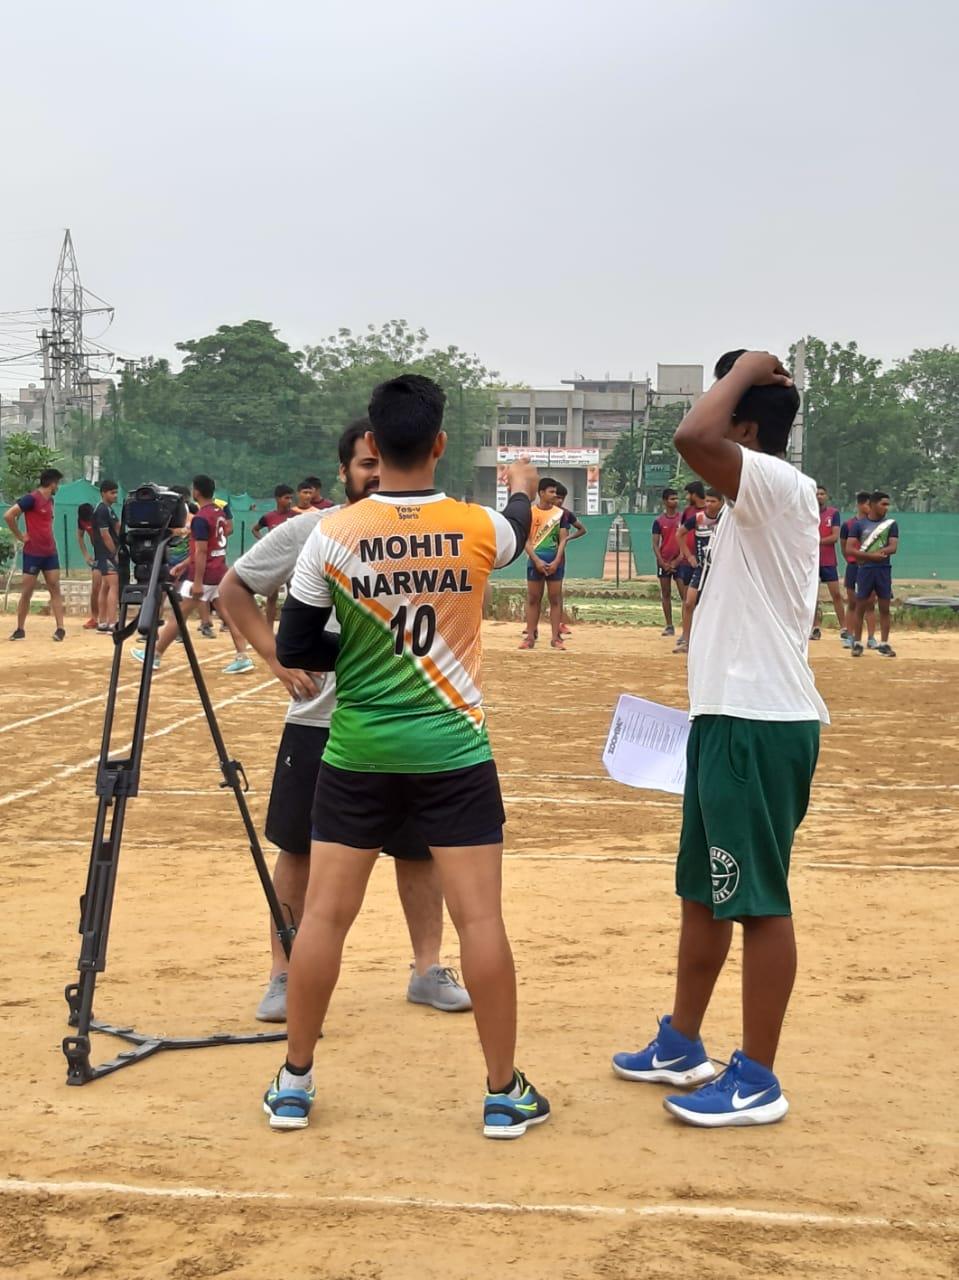 Mohit Narwal Kabaddi Academy